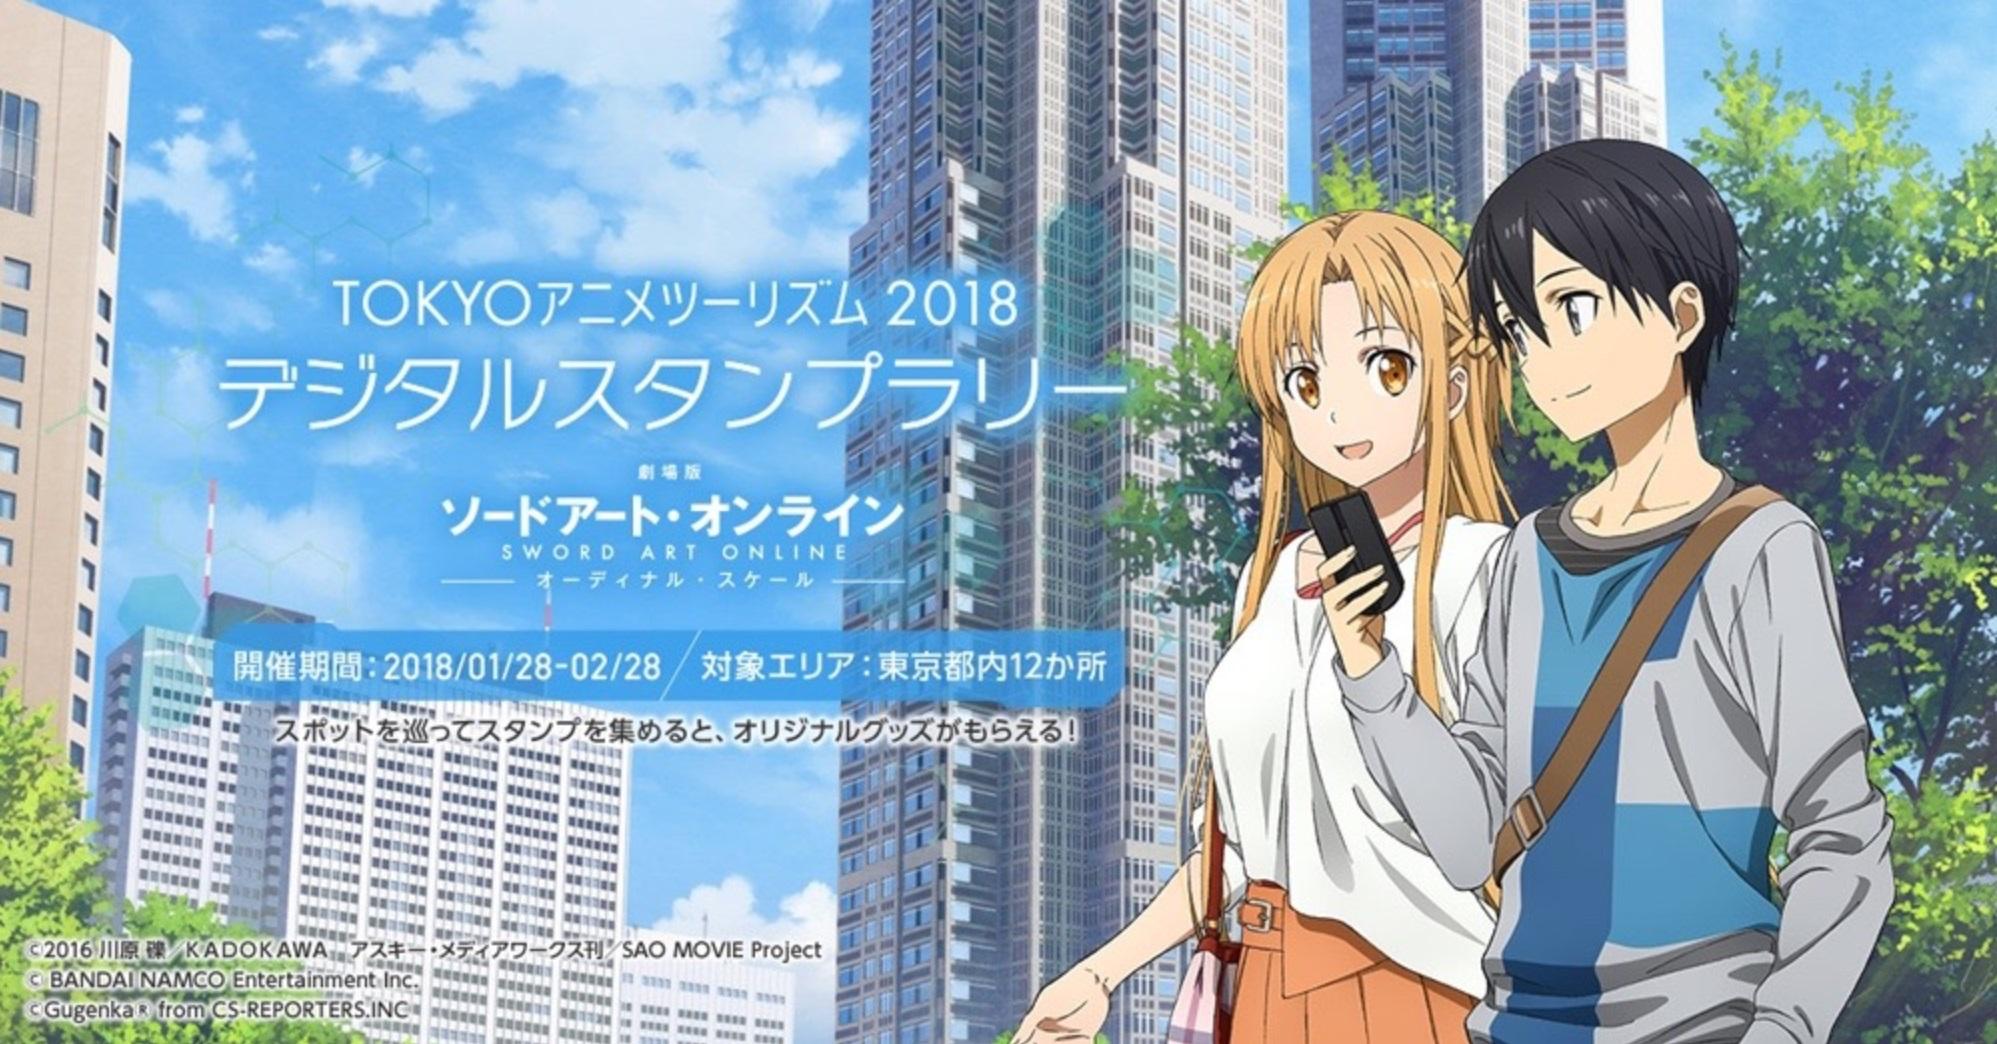 TOKYOアニメツーリズム2018 デジタルスタンプラリー(ソードアート・オンライン)